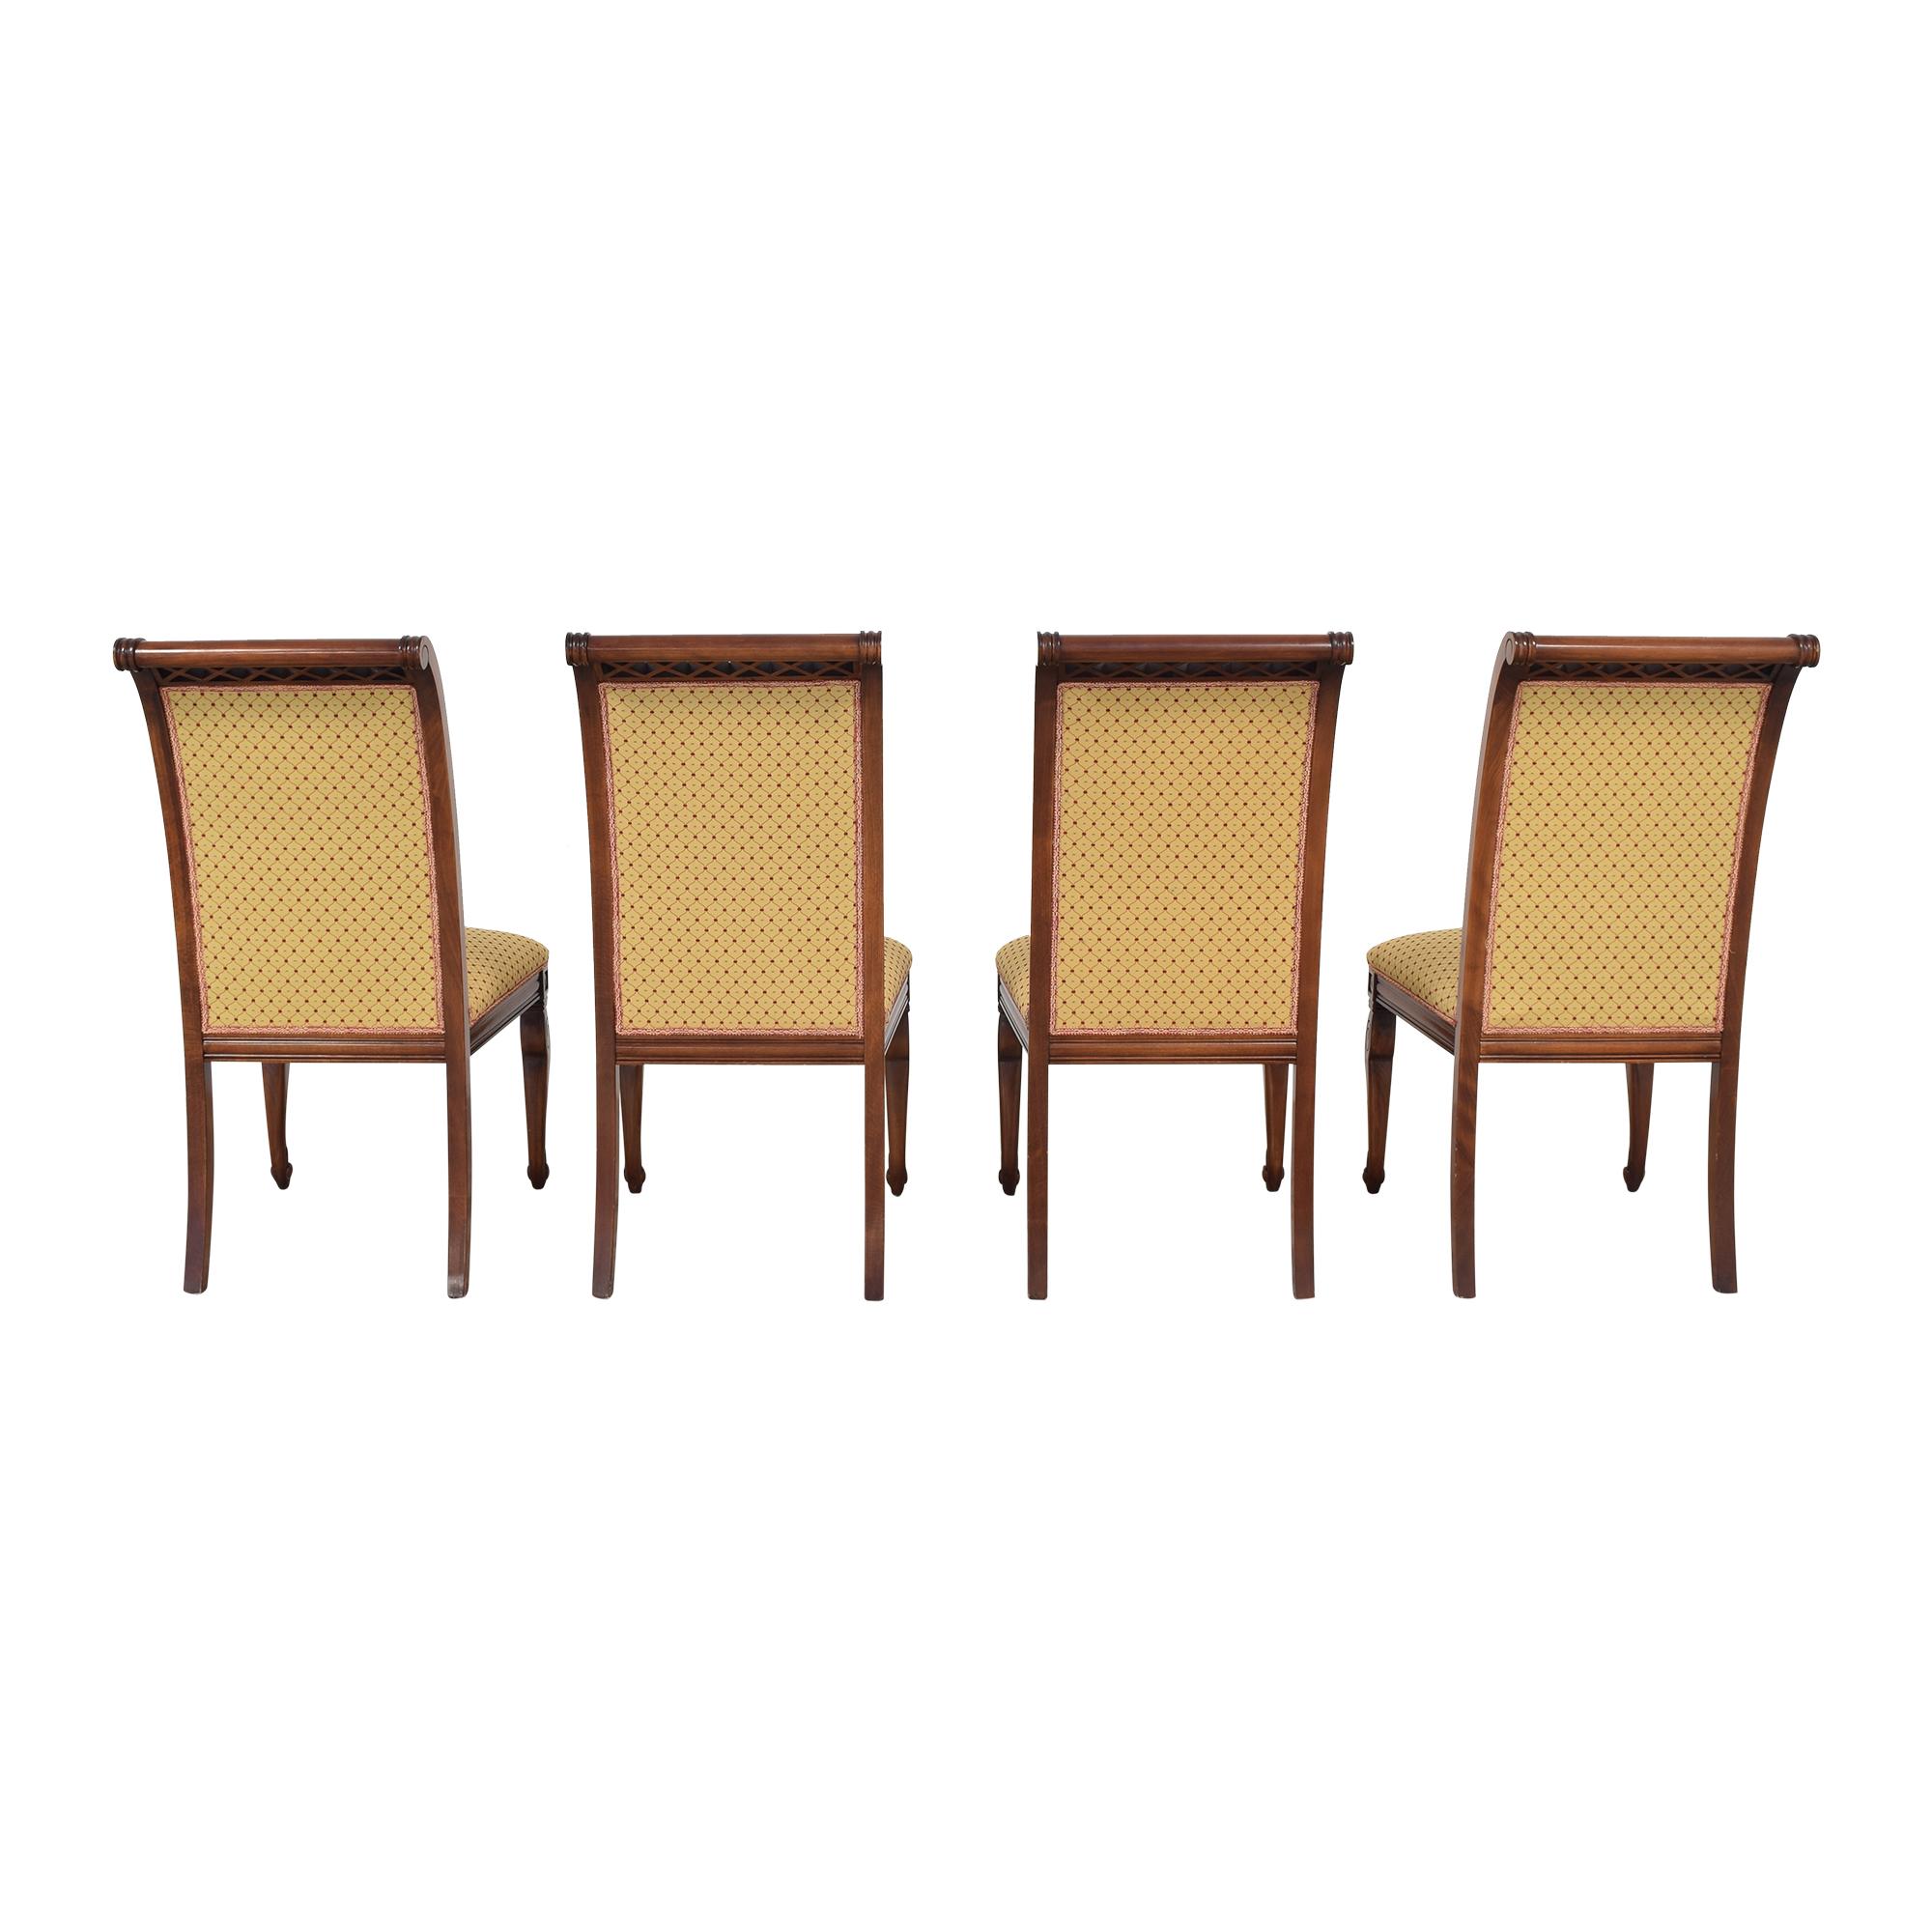 KPS Furnishings KPS Furnishings Custom Dining Chairs nj